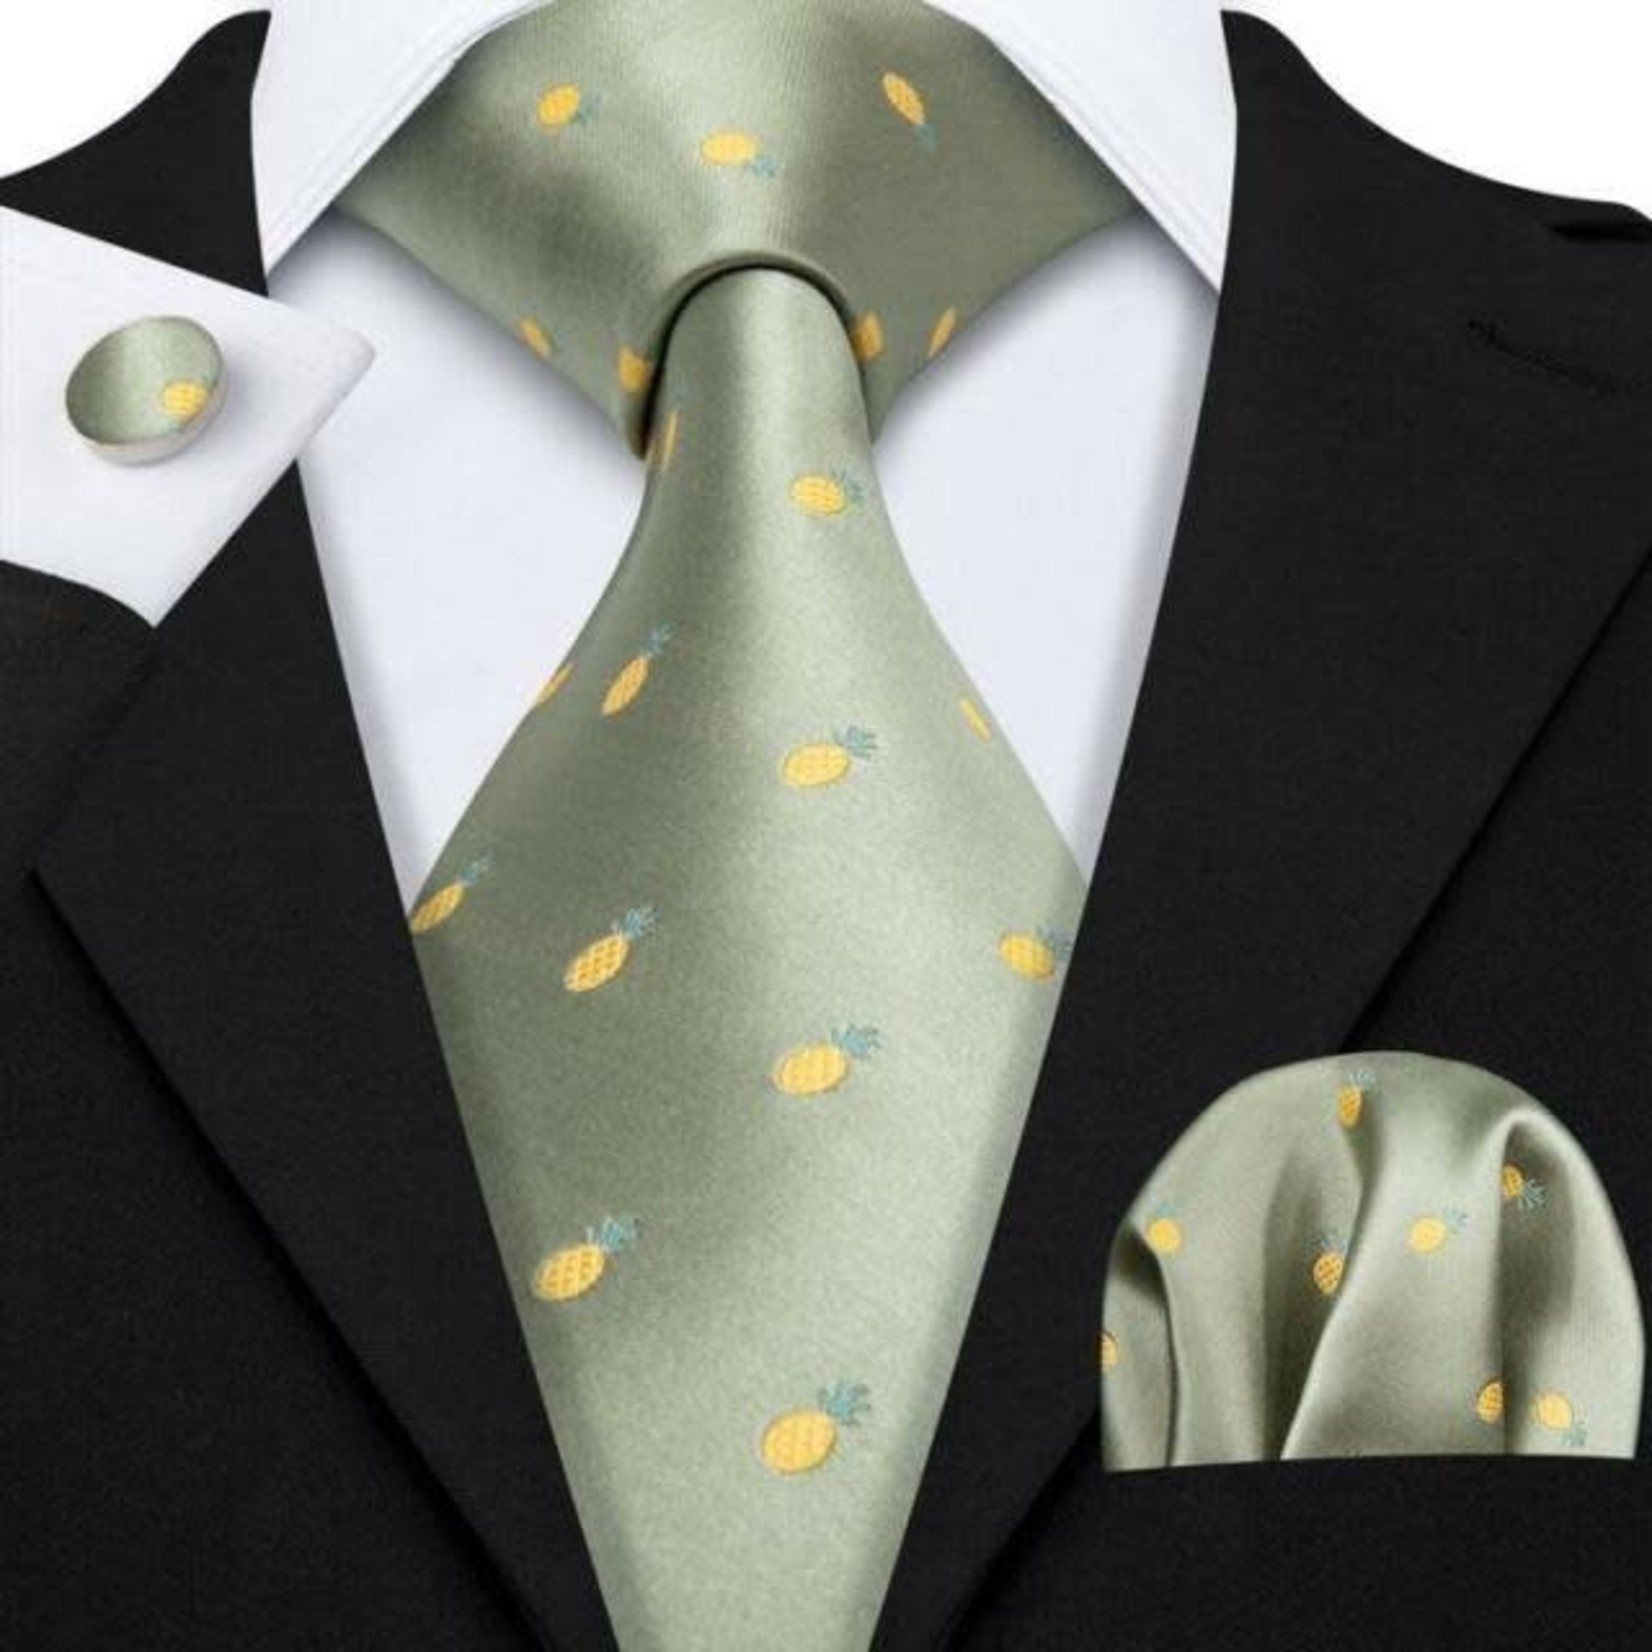 Pineapple Tie with Cuff Link Handkerchief